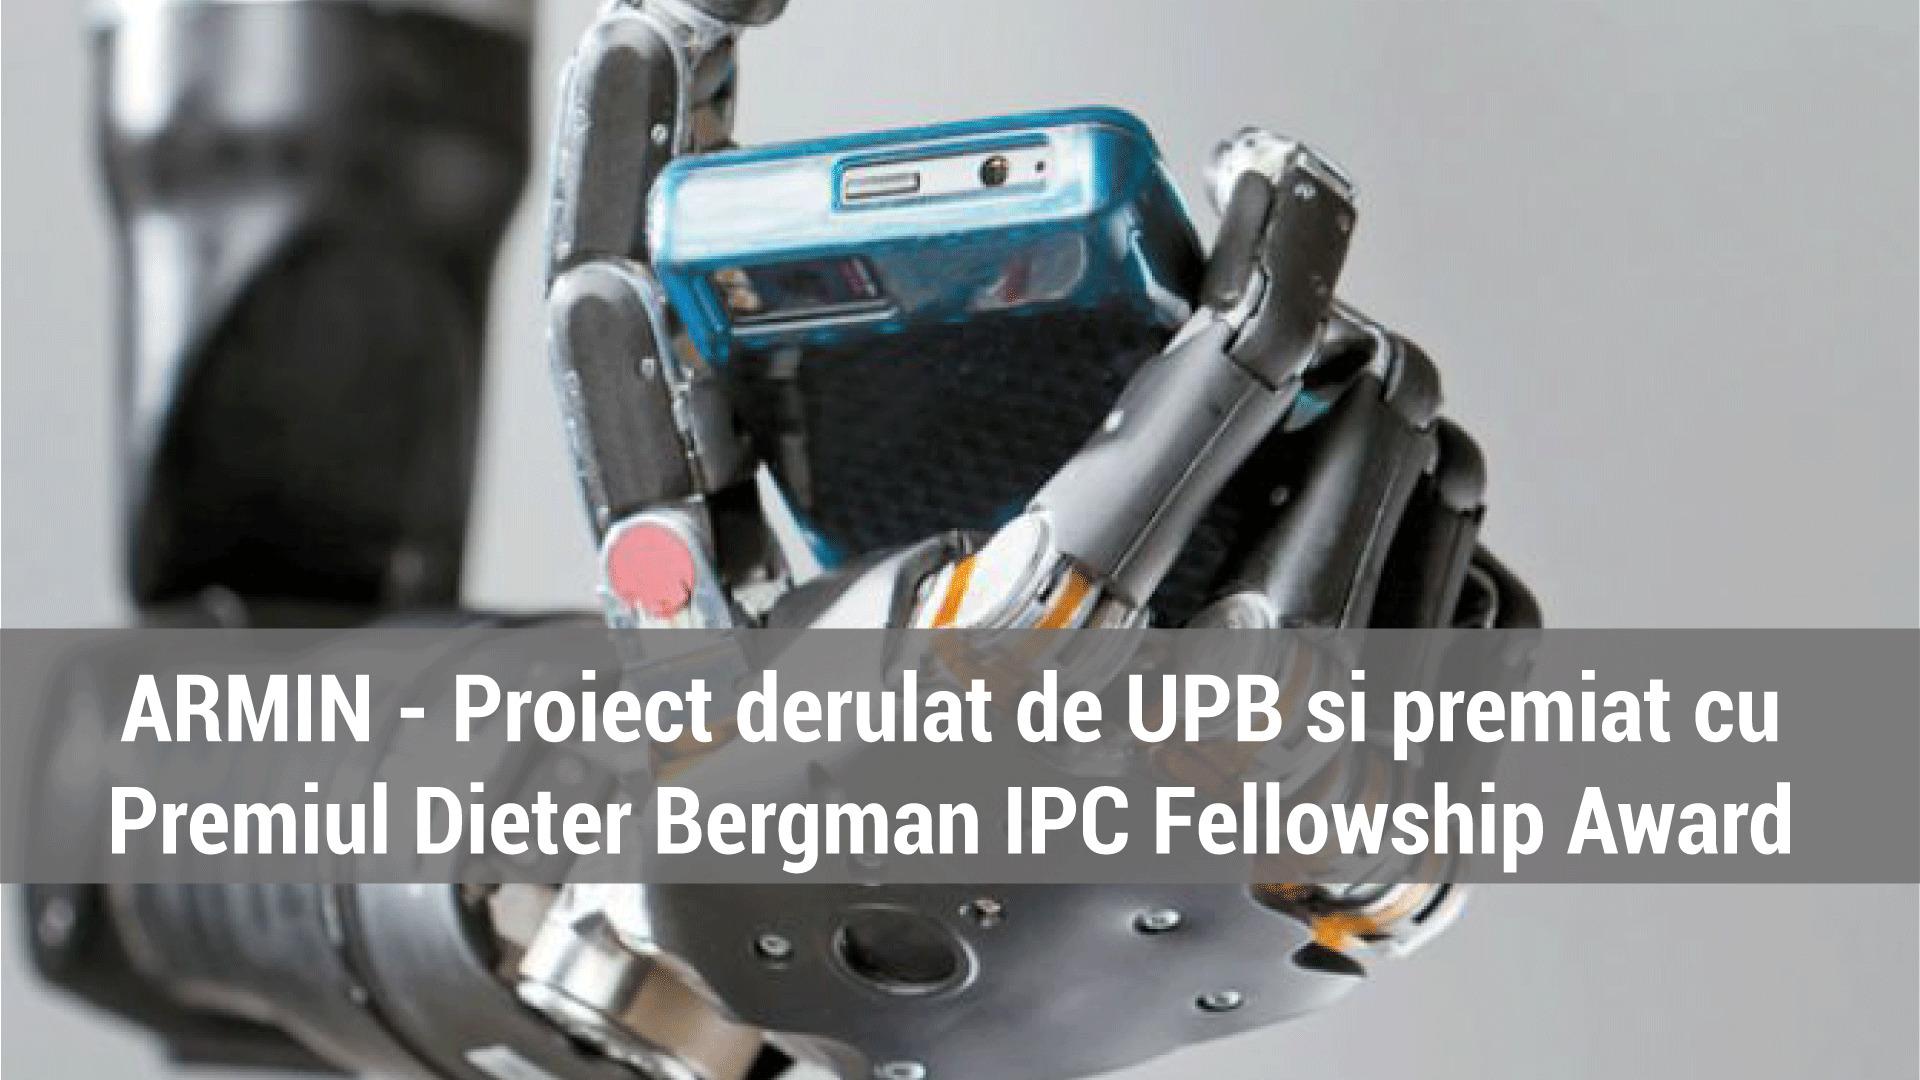 ARMIN – Proiectul derulat de UPB si premiat cu Premiul Dieter Bergman IPC Fellowship Award